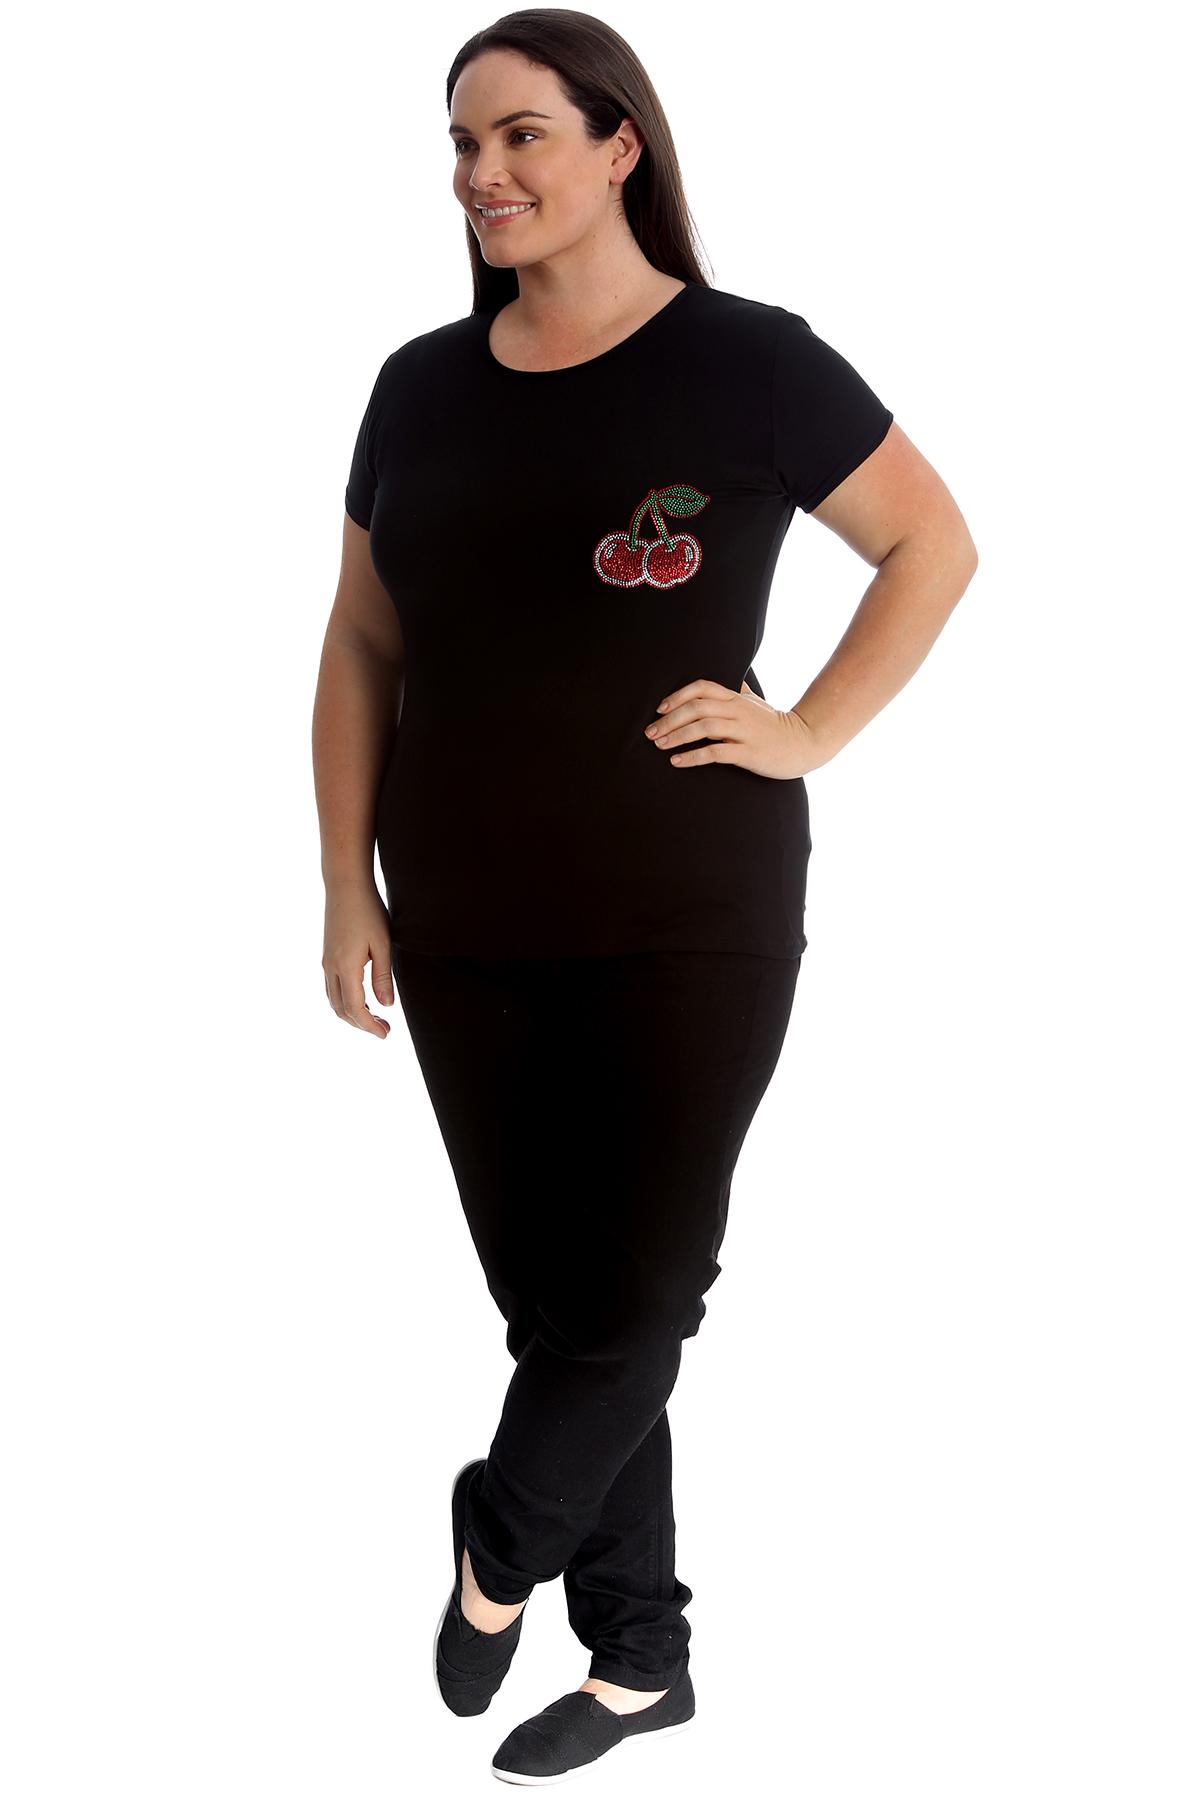 New-Womens-Plus-Size-Top-Ladies-Cherry-Rhinestone-T-Shirt-Soft-Stud-Shiny-Hip thumbnail 9